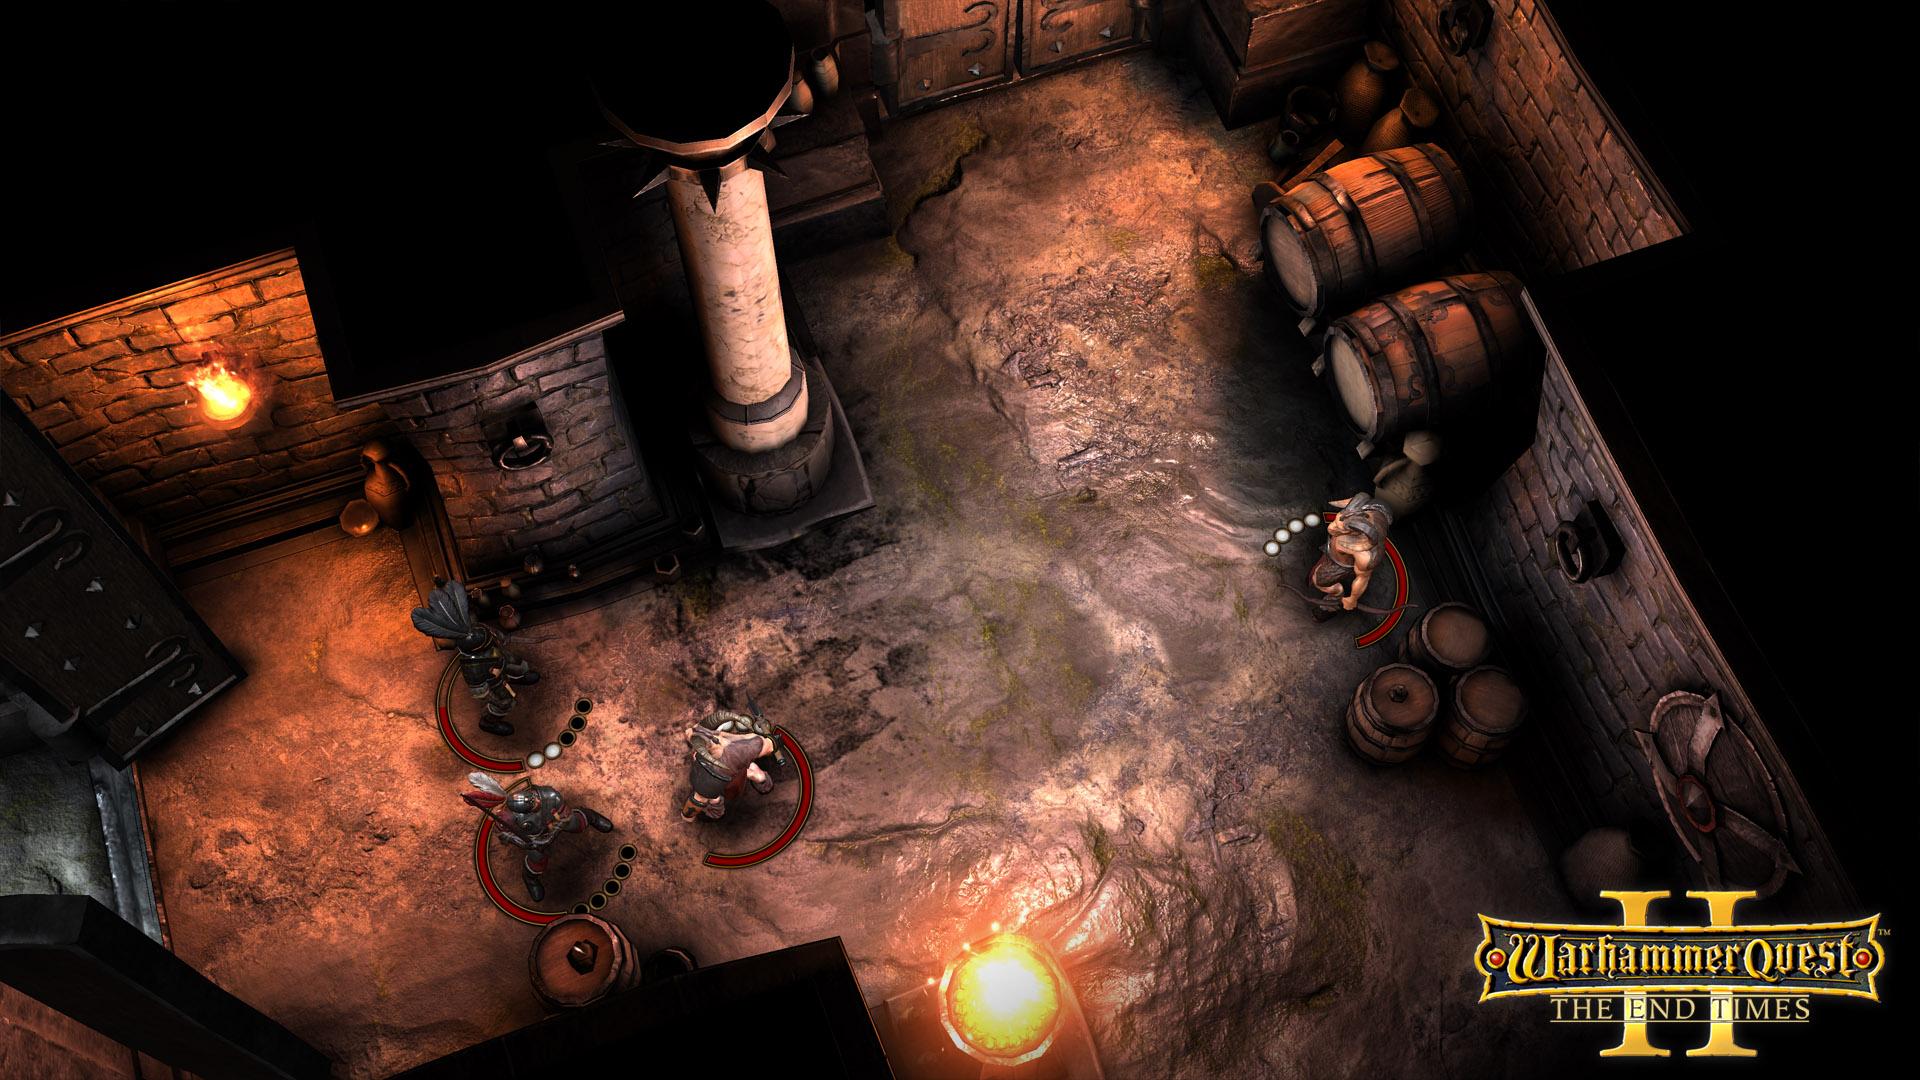 Na podzim oznámen Warhammer Quest 2 140578